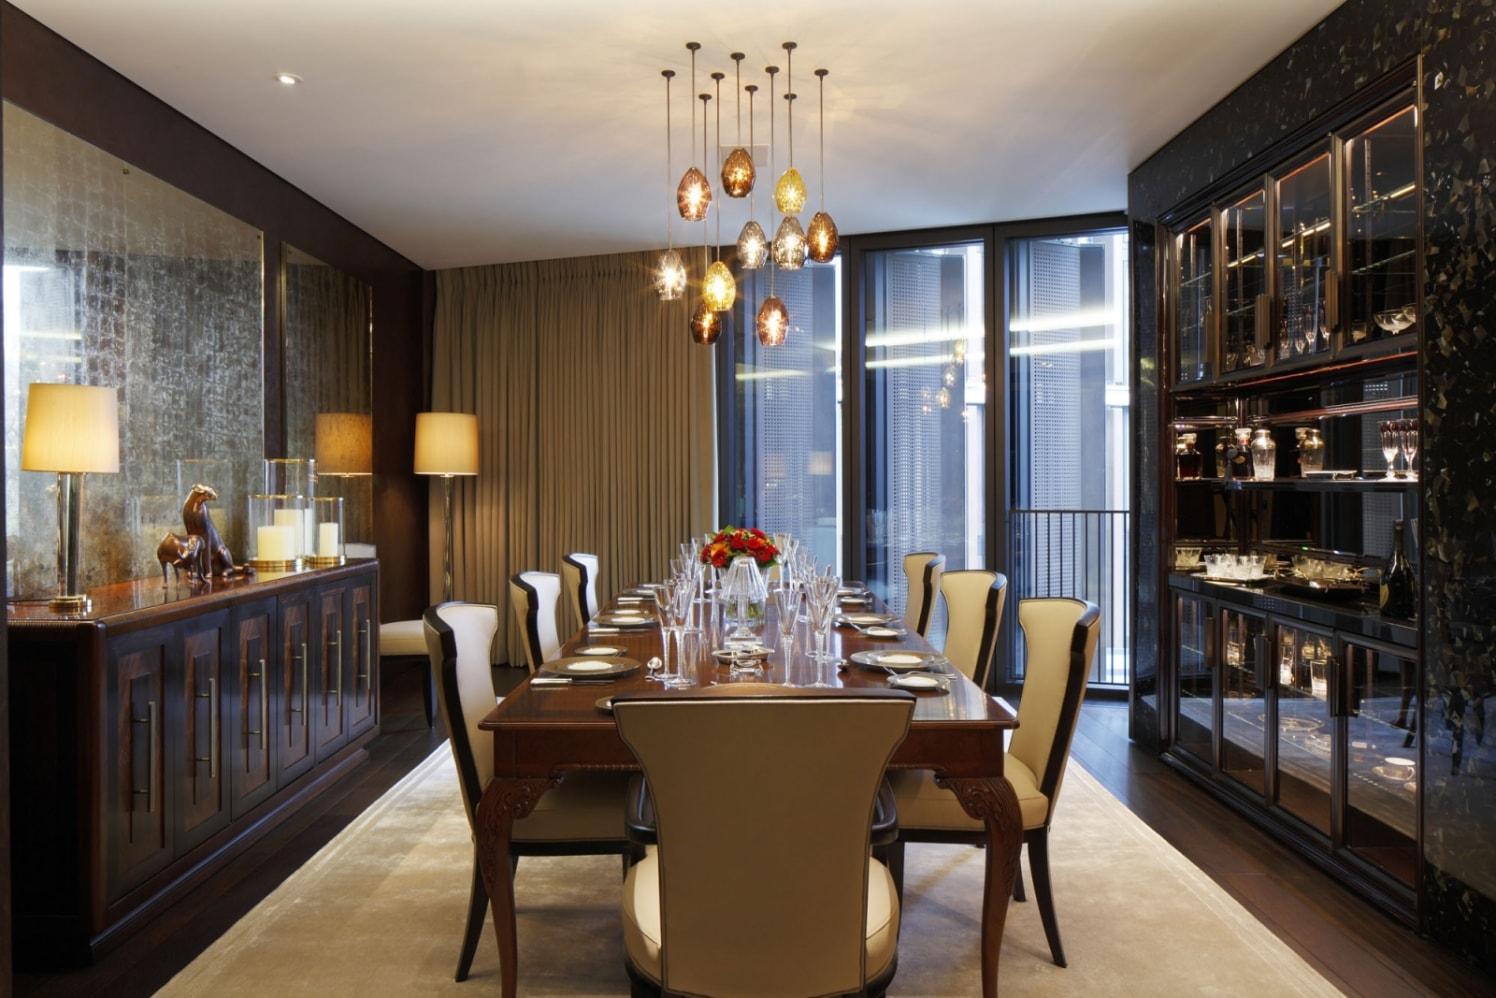 Lavish dining area styles by KA Design Dining-room Contemporary | Interior Design Photos & Ideas